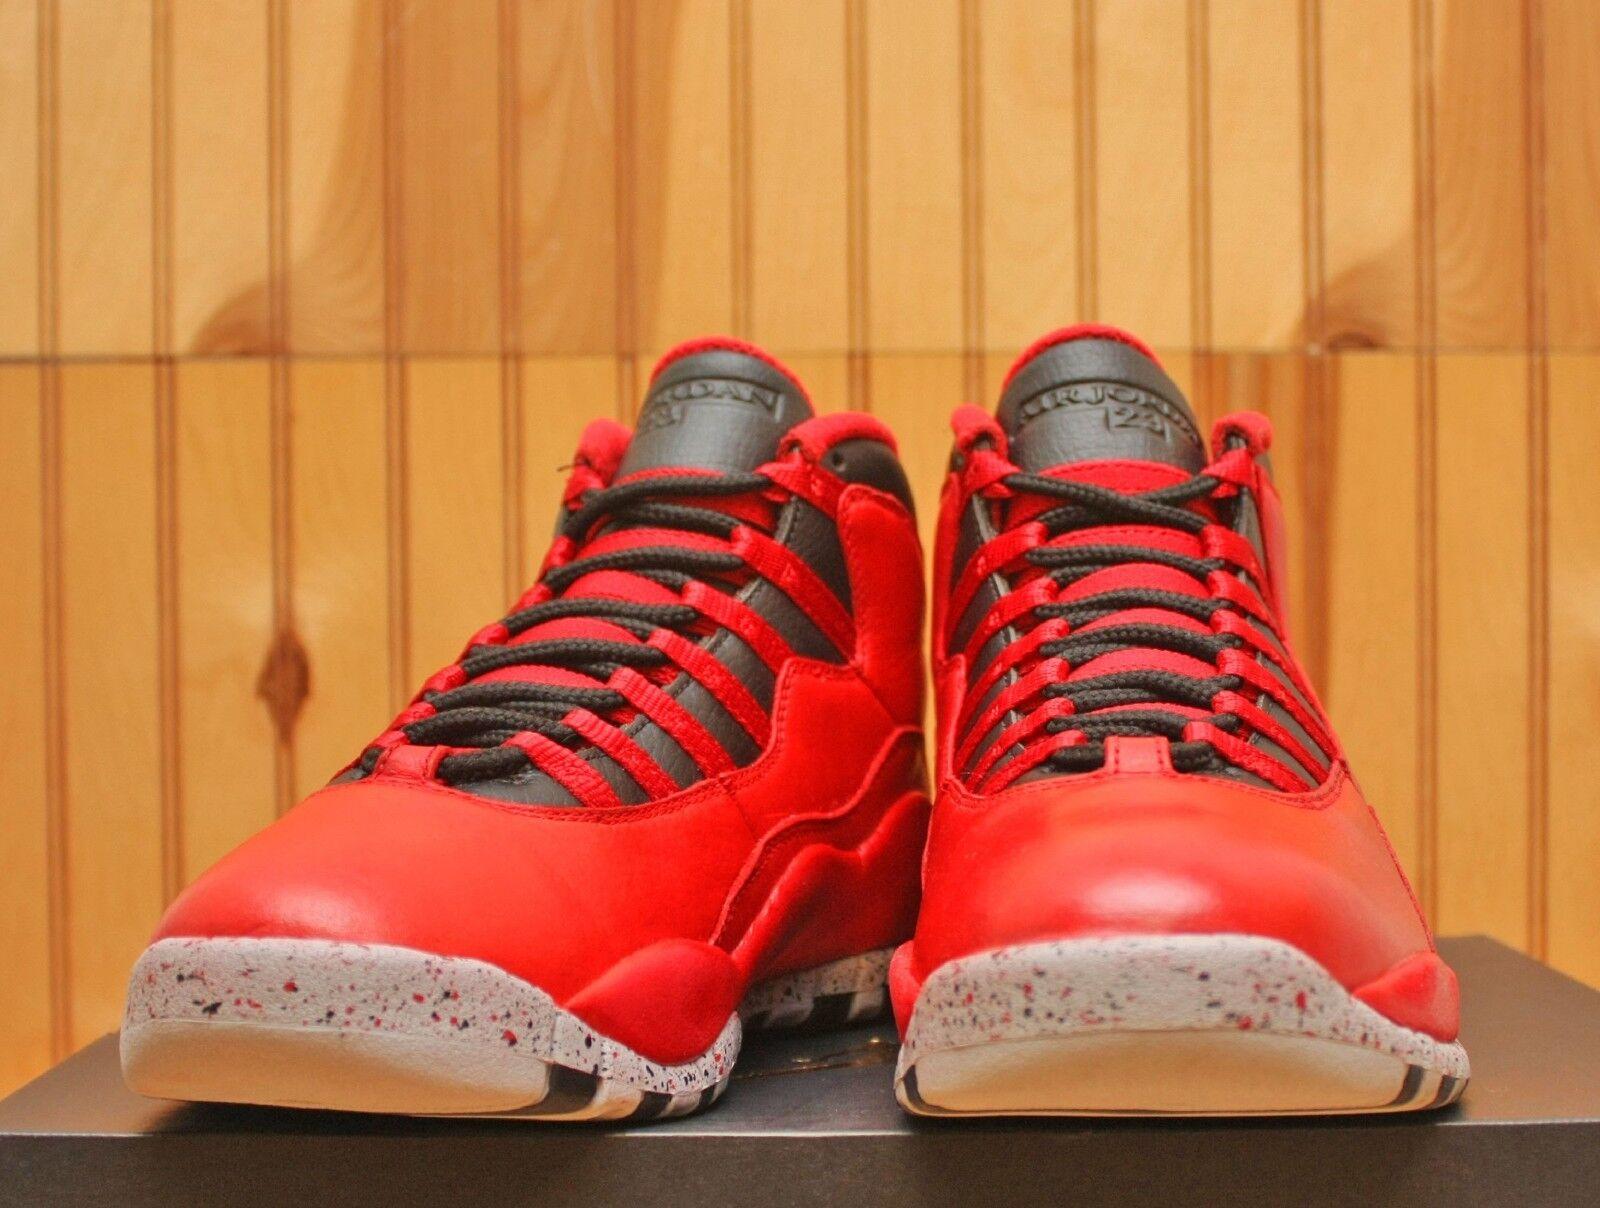 big sale f1470 d7a45 Nike Air Jordan x 10 retro cómodo el modelo mas vendido vendido mas de la  marca 49dbc8